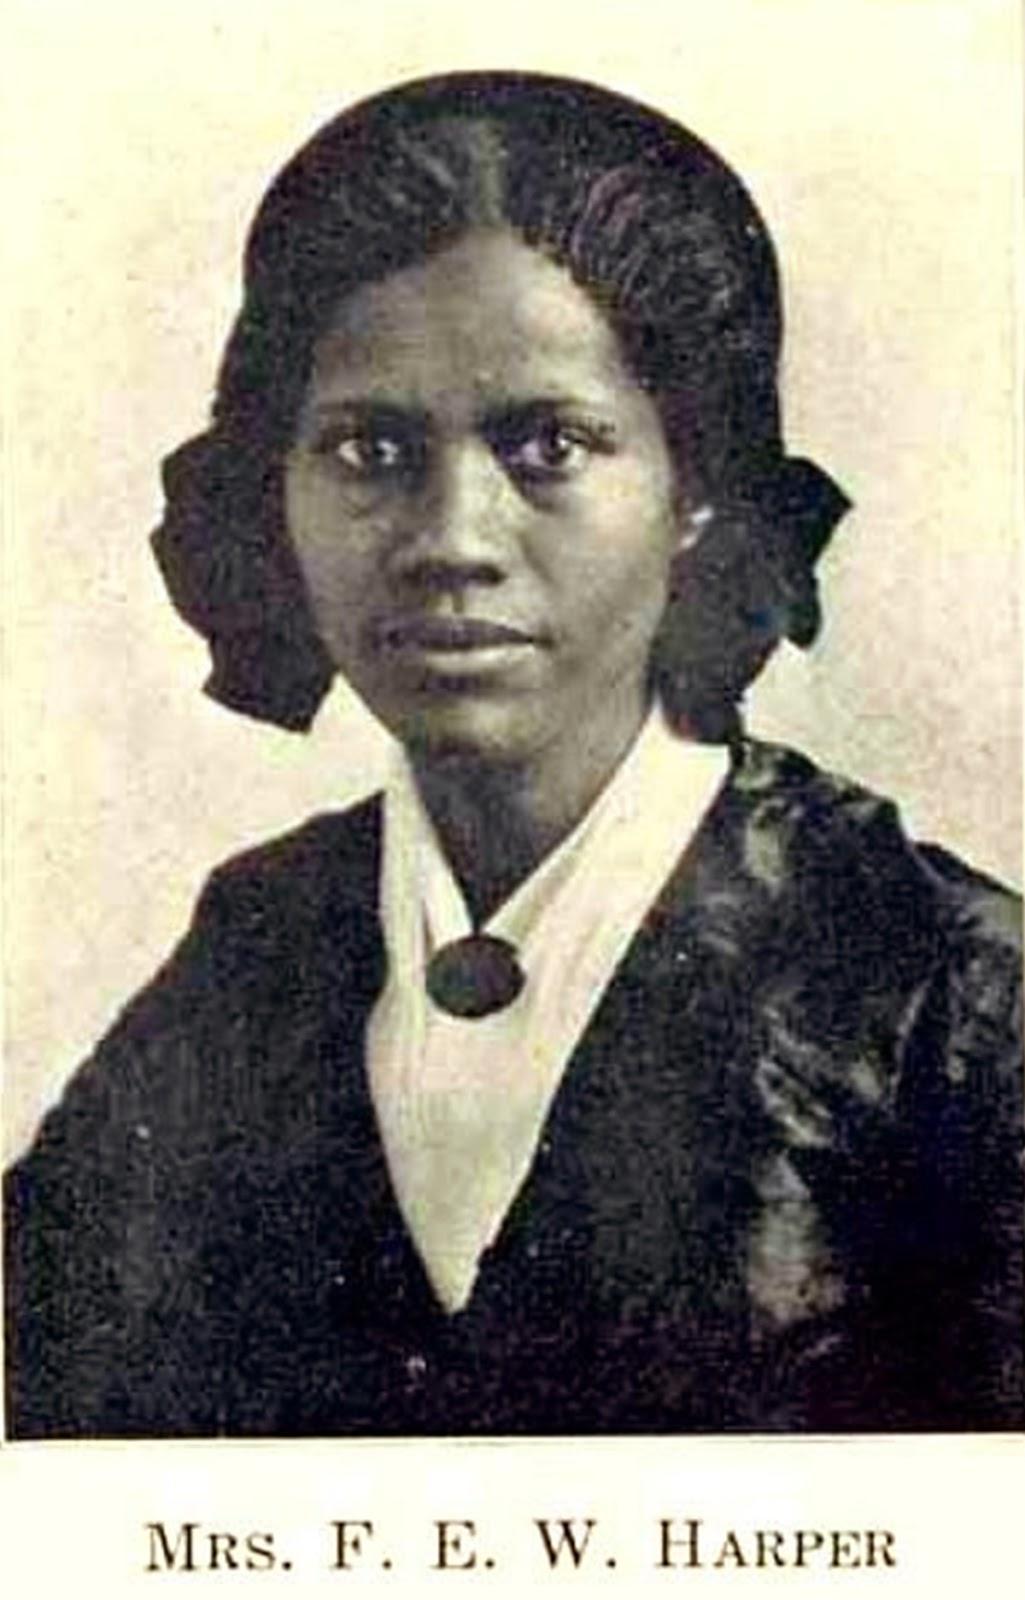 Frances+Harper+Black+History+African+History.jpg